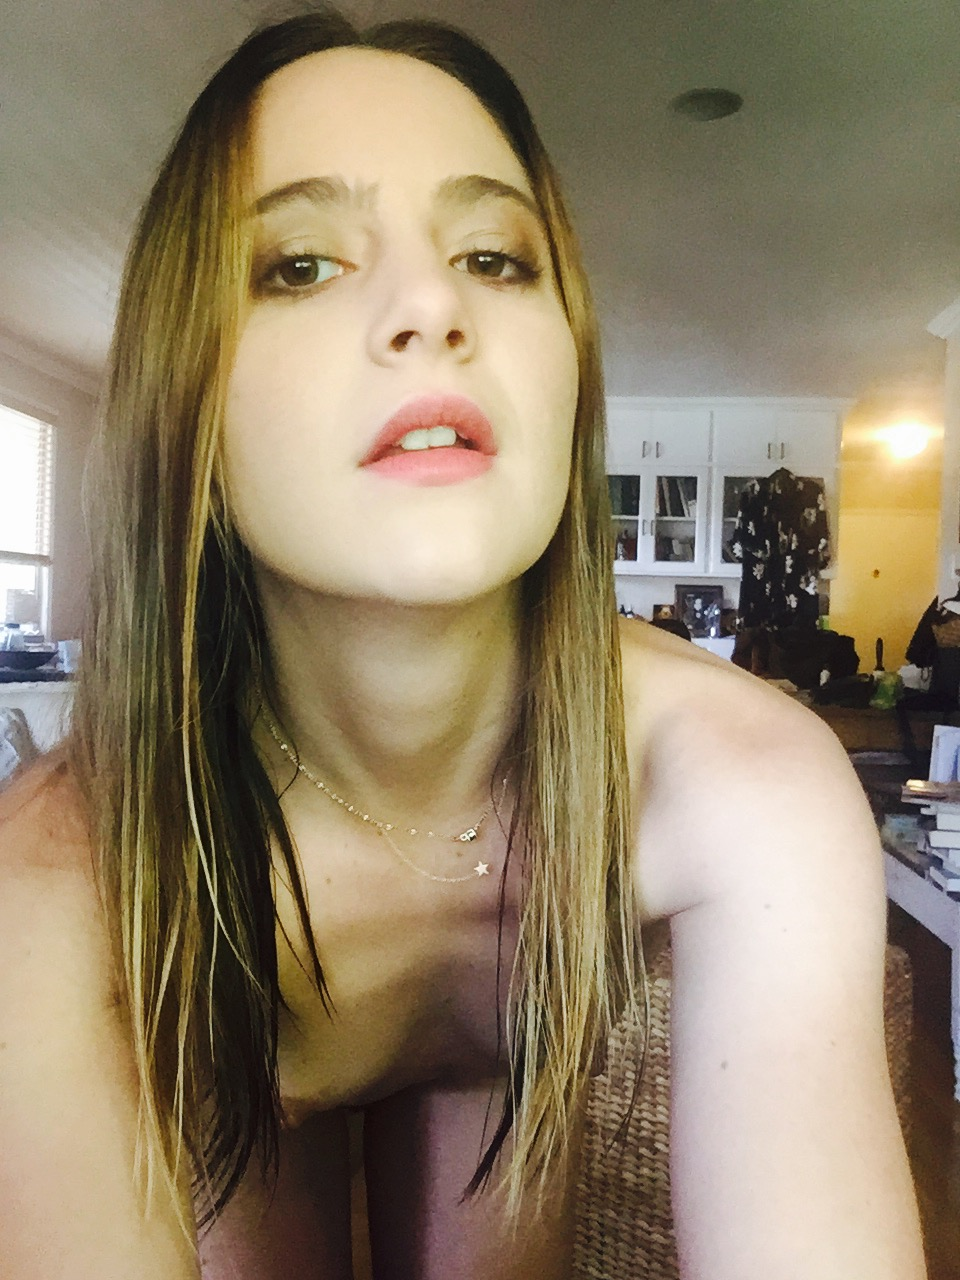 Dawn Jaro leaked. 2018-2019 celebrityes photos leaks! XXX videos Chloe Dykstra leaked. 2018-2019 celebrityes photos leaks!,Kim Kardashian Walks The Streets In A Sheer Top With No Bra